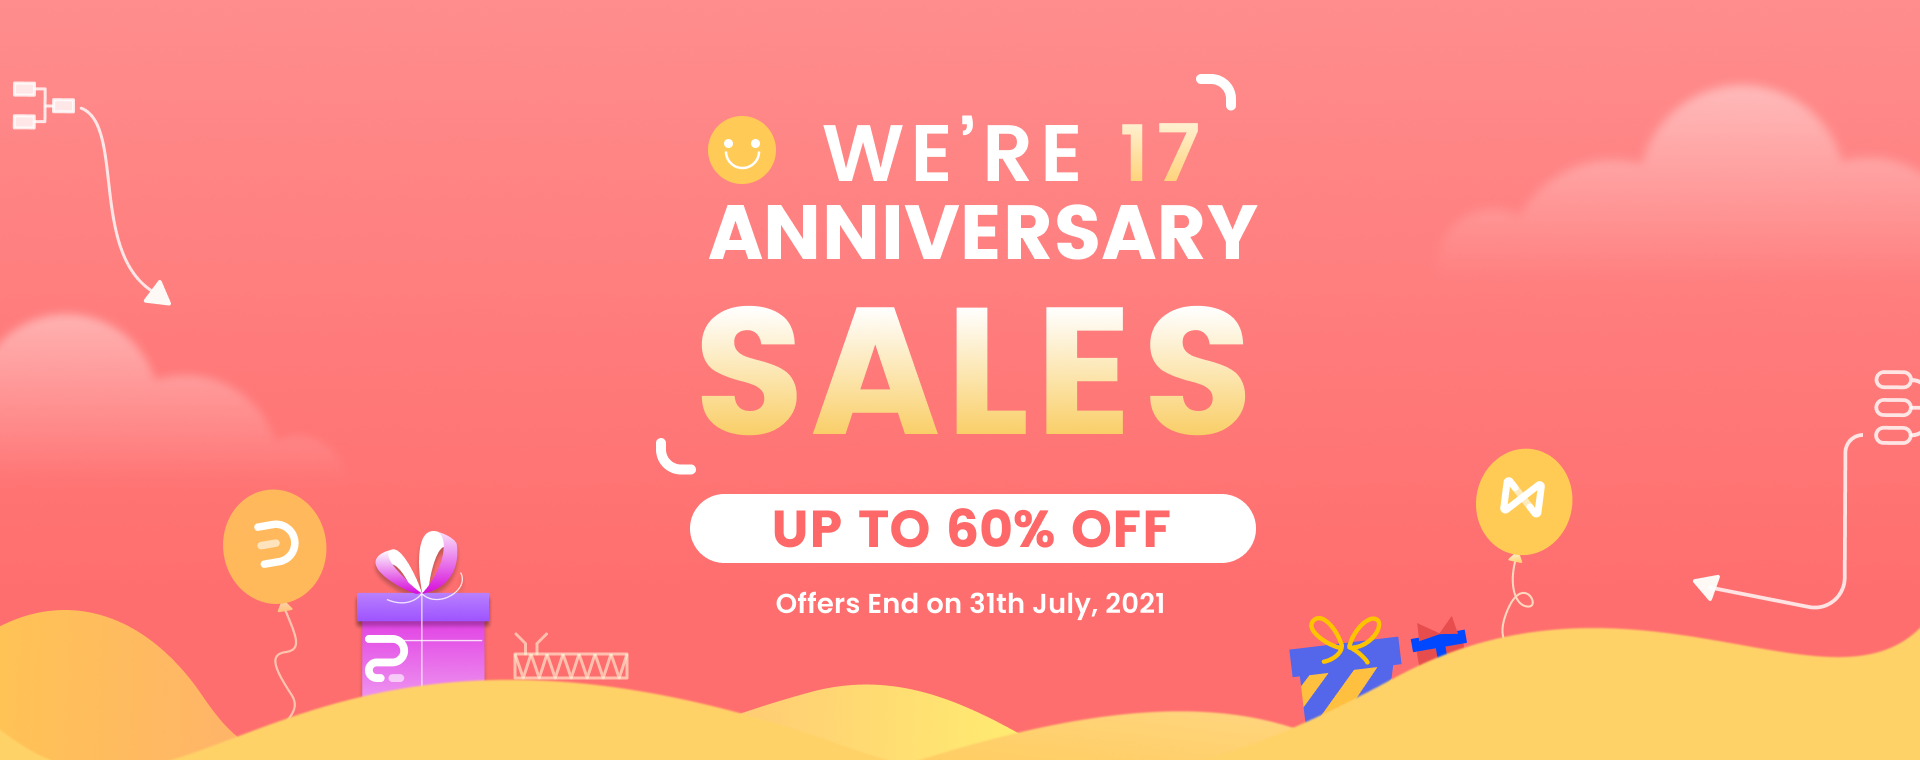 edraw anniversary sales